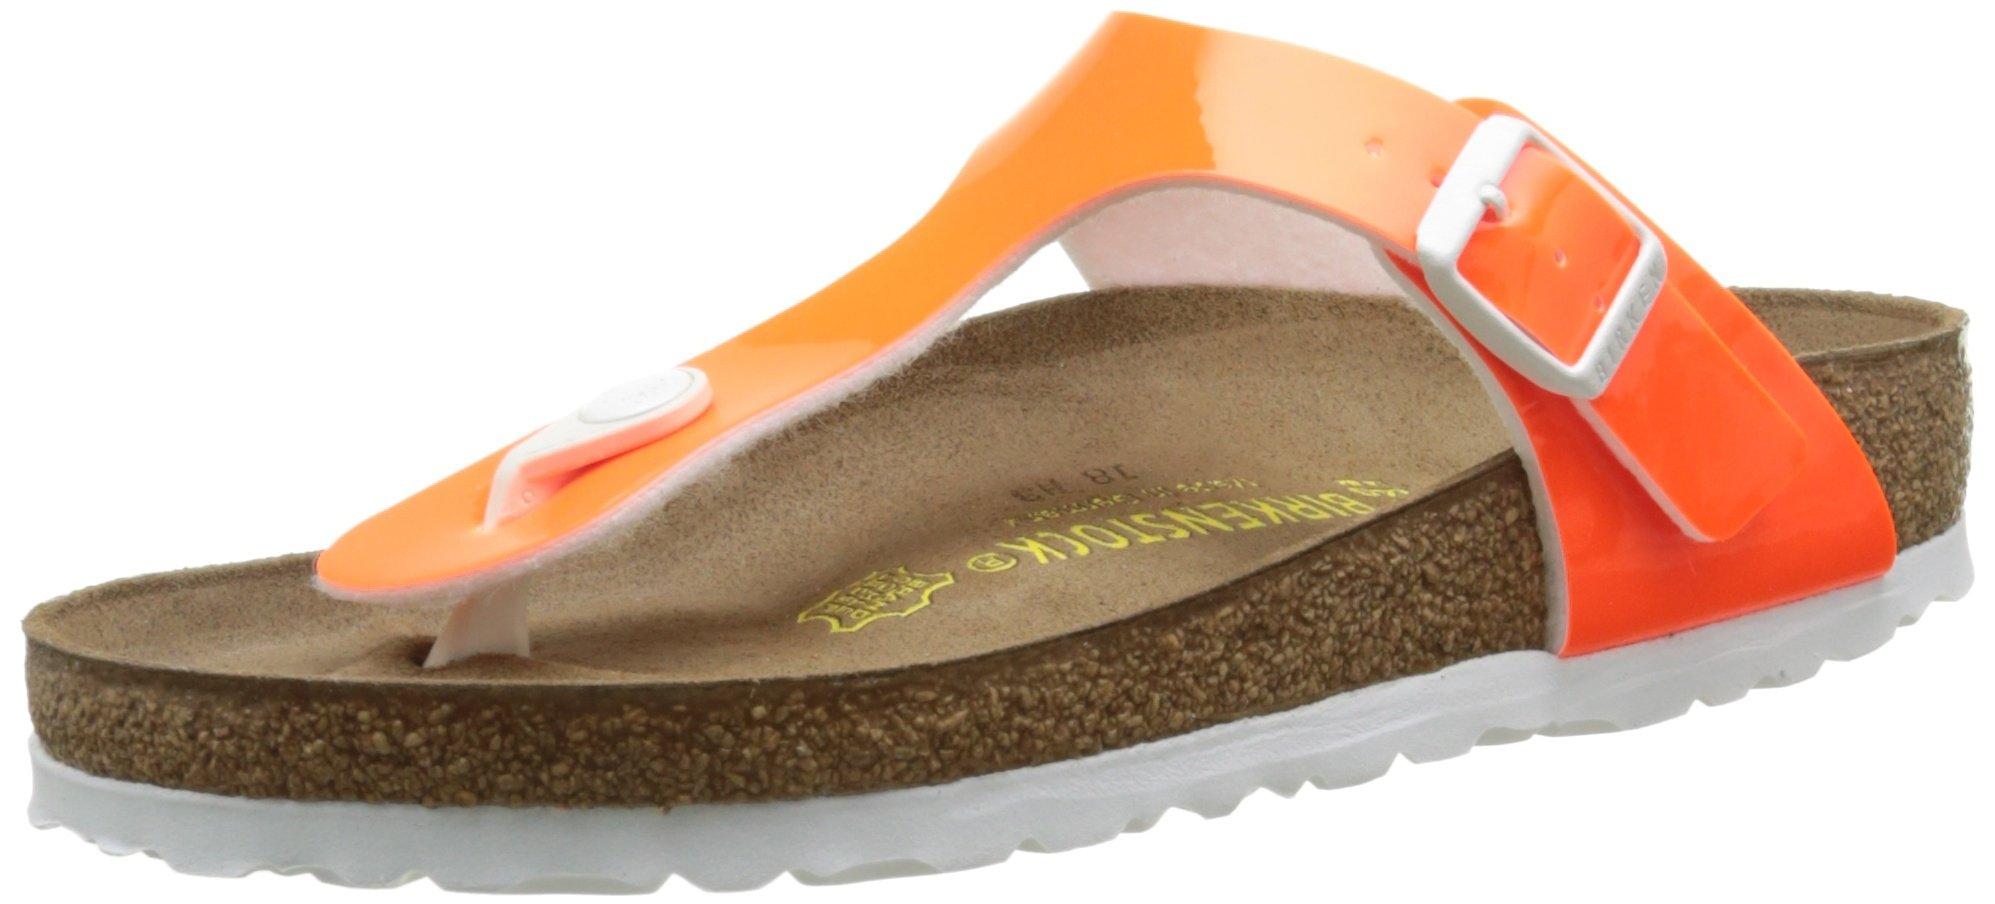 Birkenstock GIZEH Ladies Toe Post Sandals Neon Orange Orange GIZEH 40